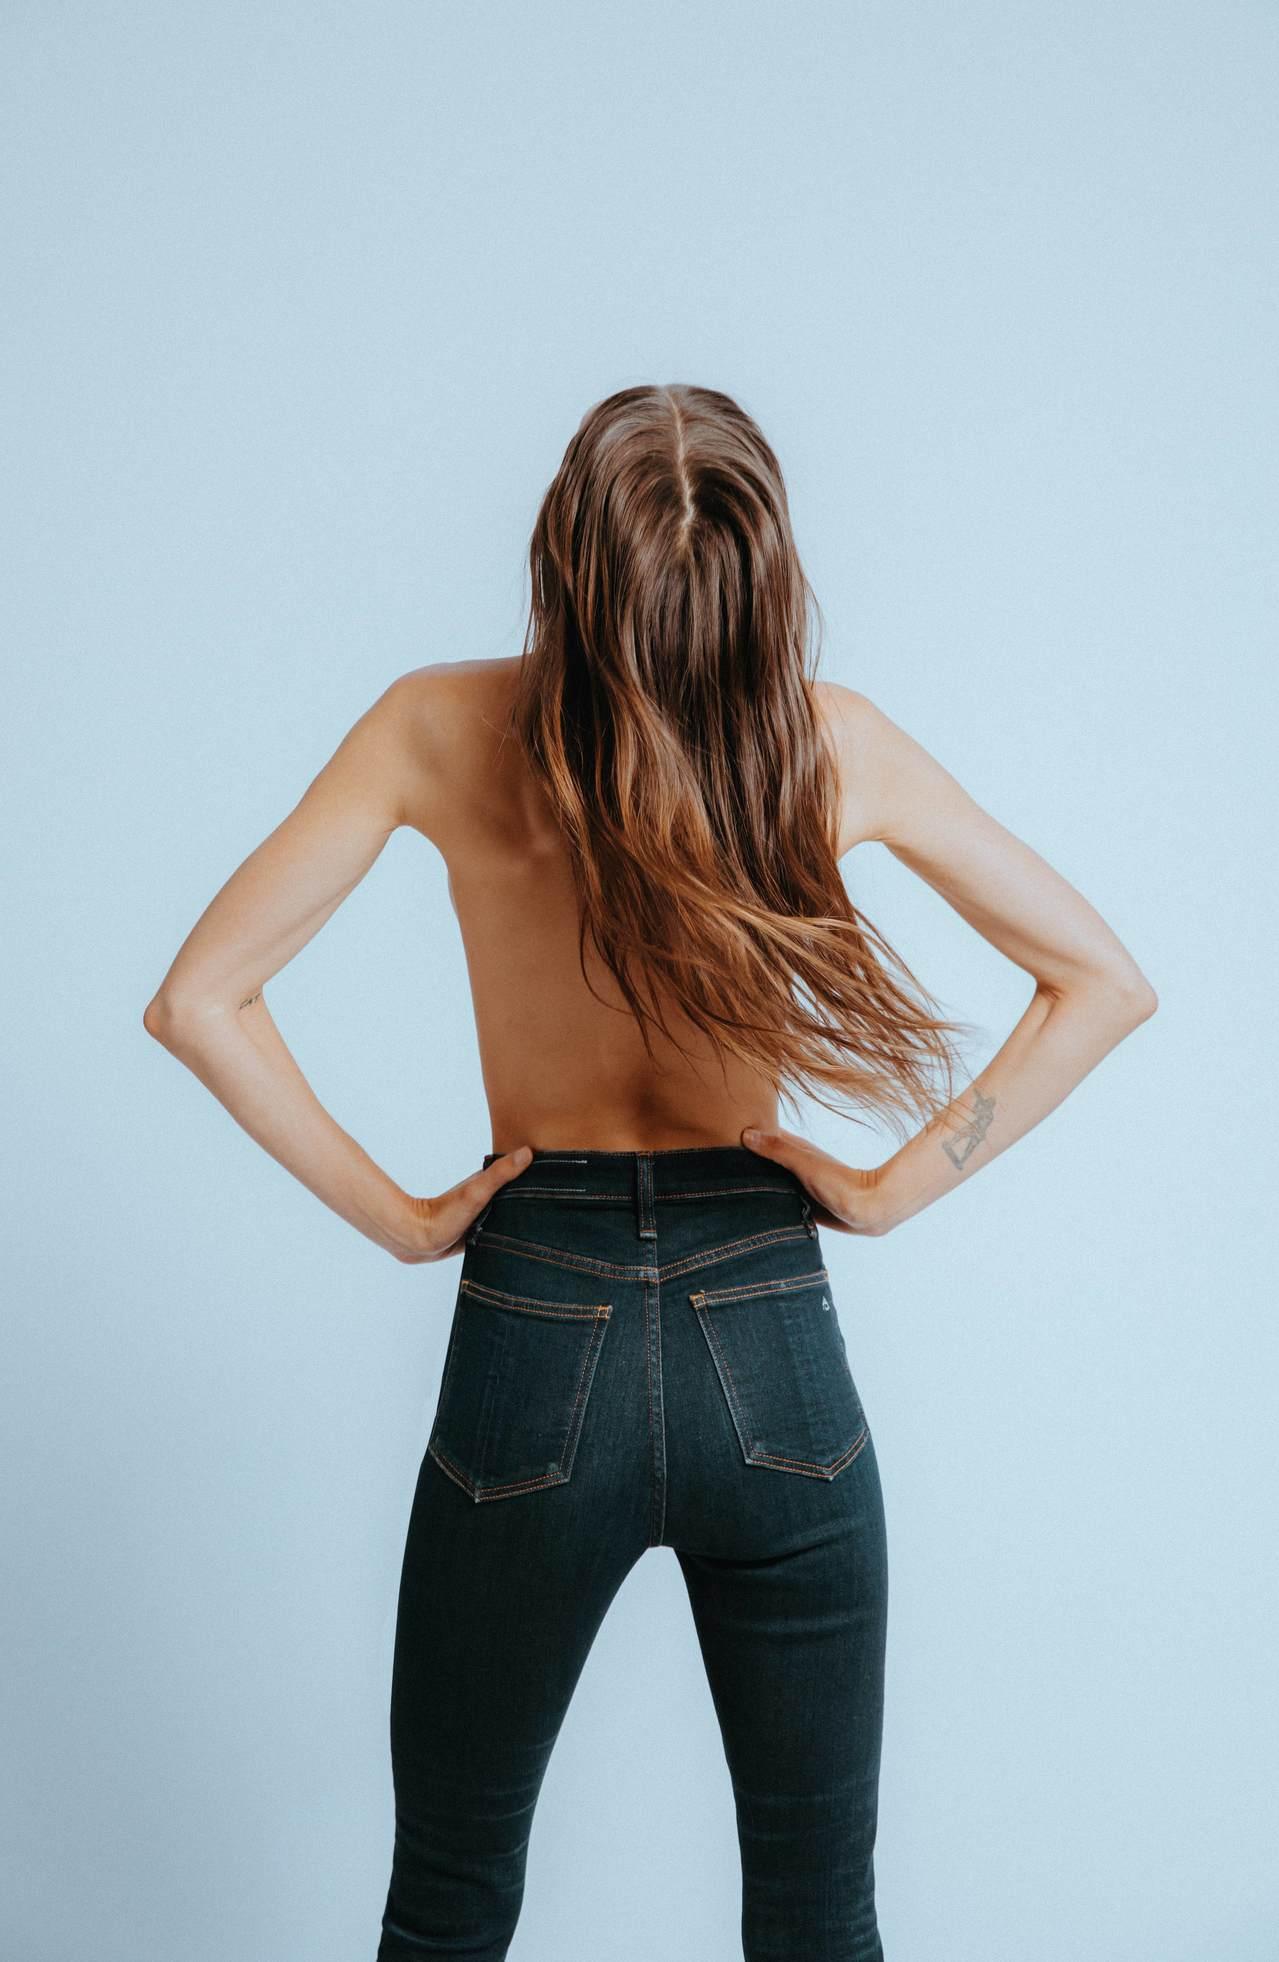 Bianca Balti身穿rag & bone Jane超高腰窄管褲。圖/ra...